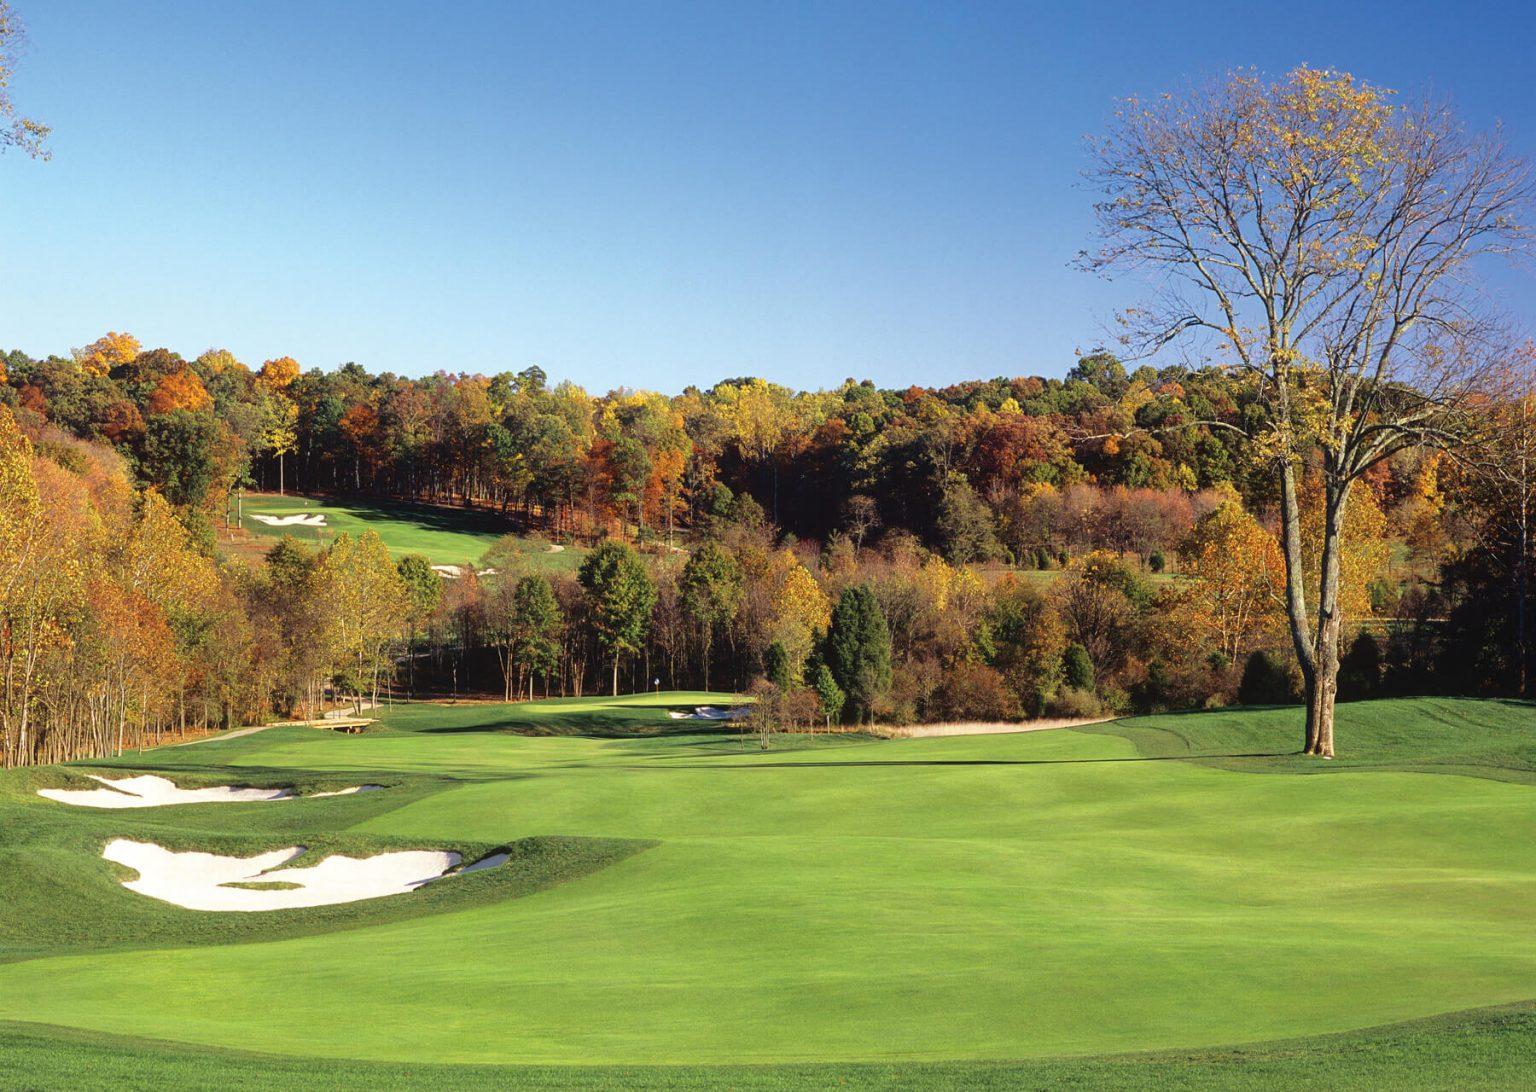 creighton farms golf course eleventh hole